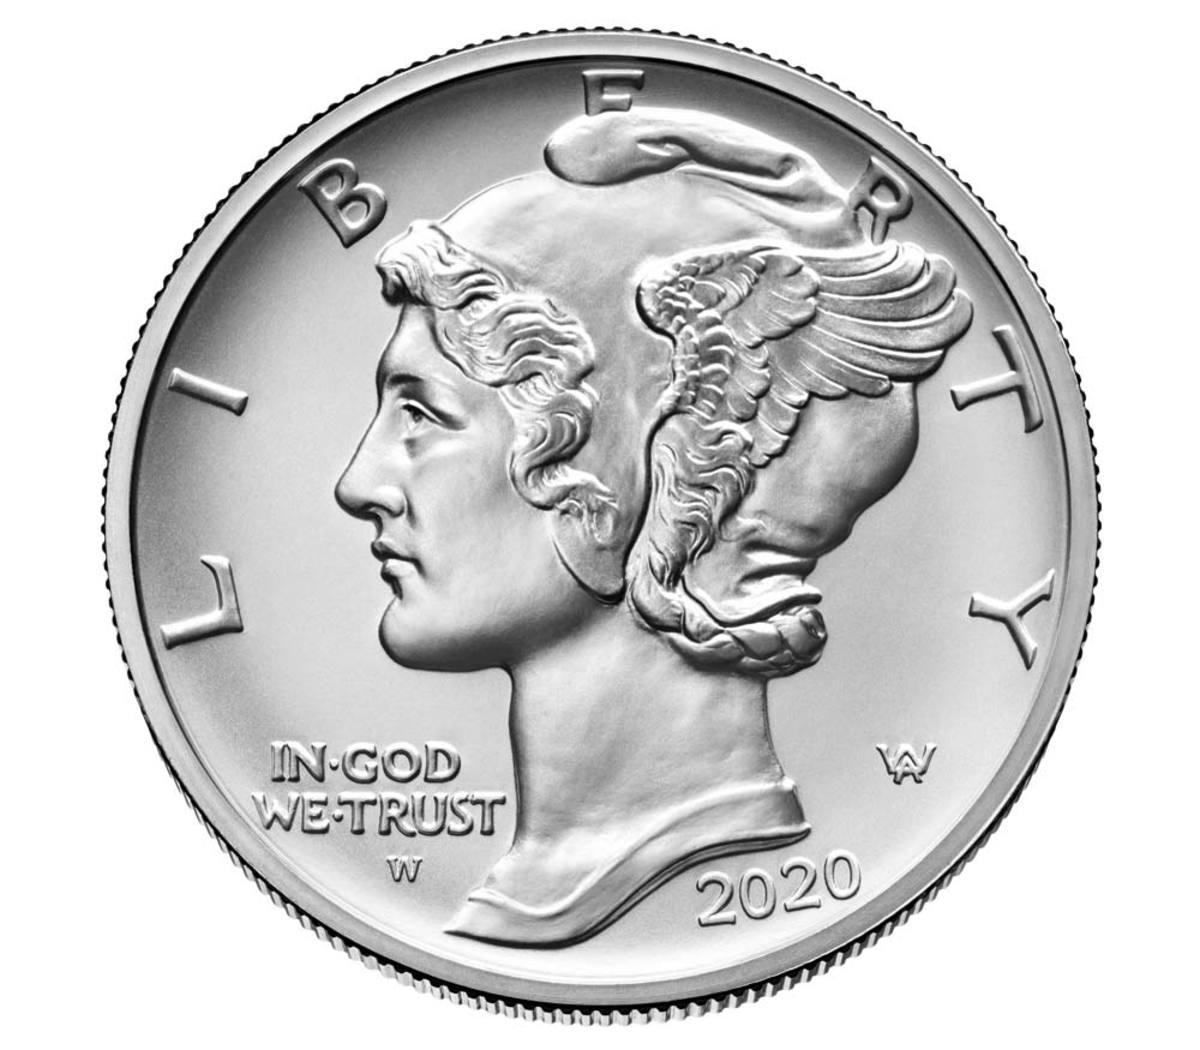 American Eagle 2020 One Ounce Uncirculated Palladium coin